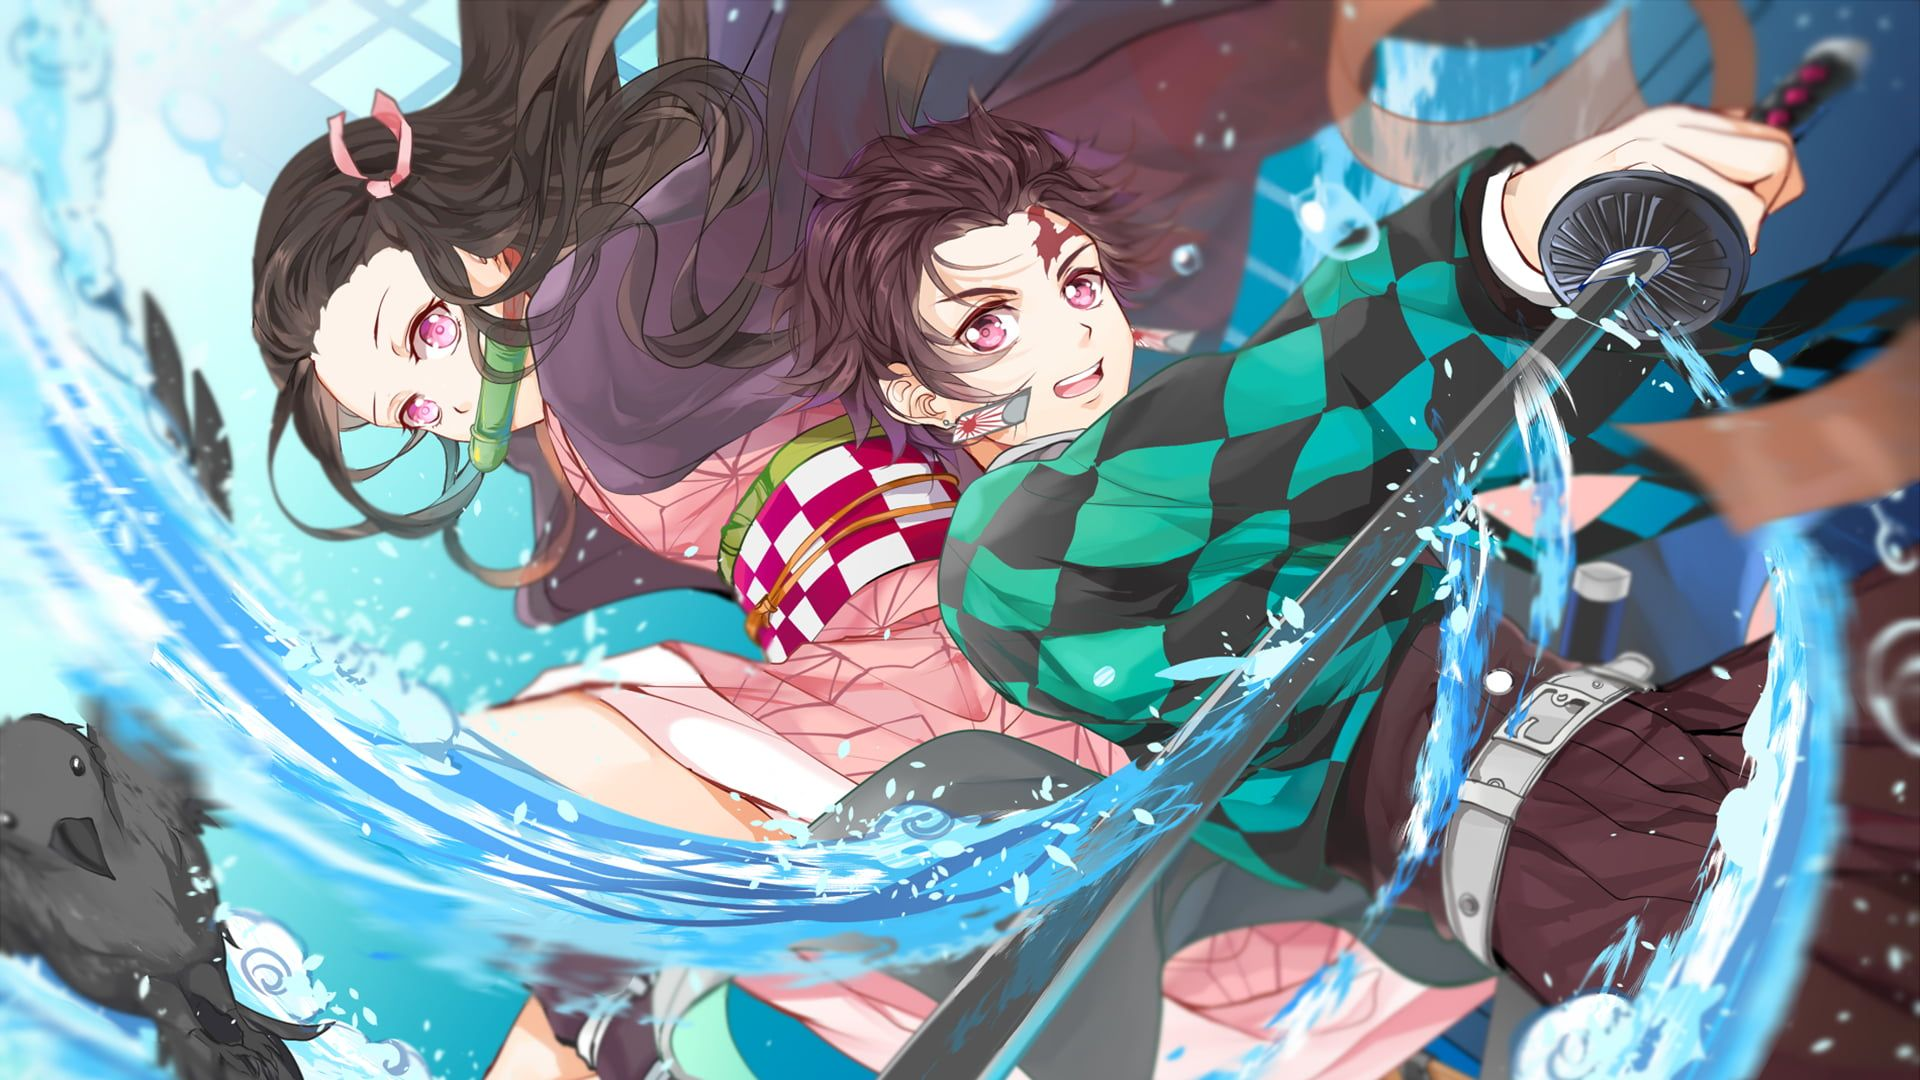 Anime Demon Slayer Kimetsu No Yaiba Belt Boy Brown Hair Earrings Girl Katana Kimetsu No Yaiba Long Hai In 2020 Anime Cool Anime Wallpapers Sailor Moon Wallpaper